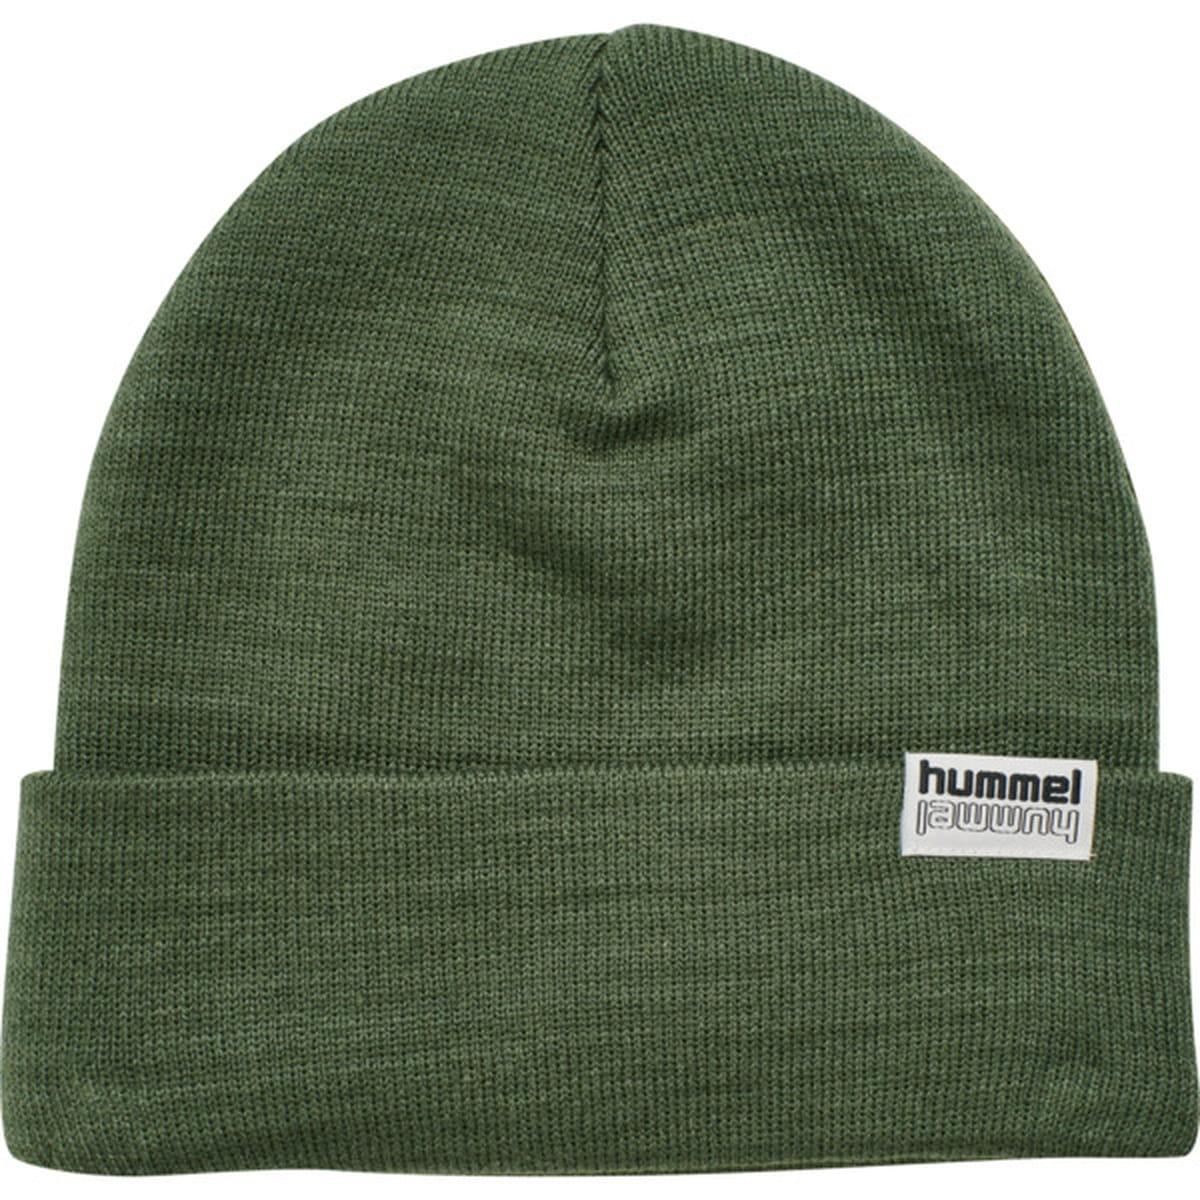 Hummel Park Beanie - Thyme